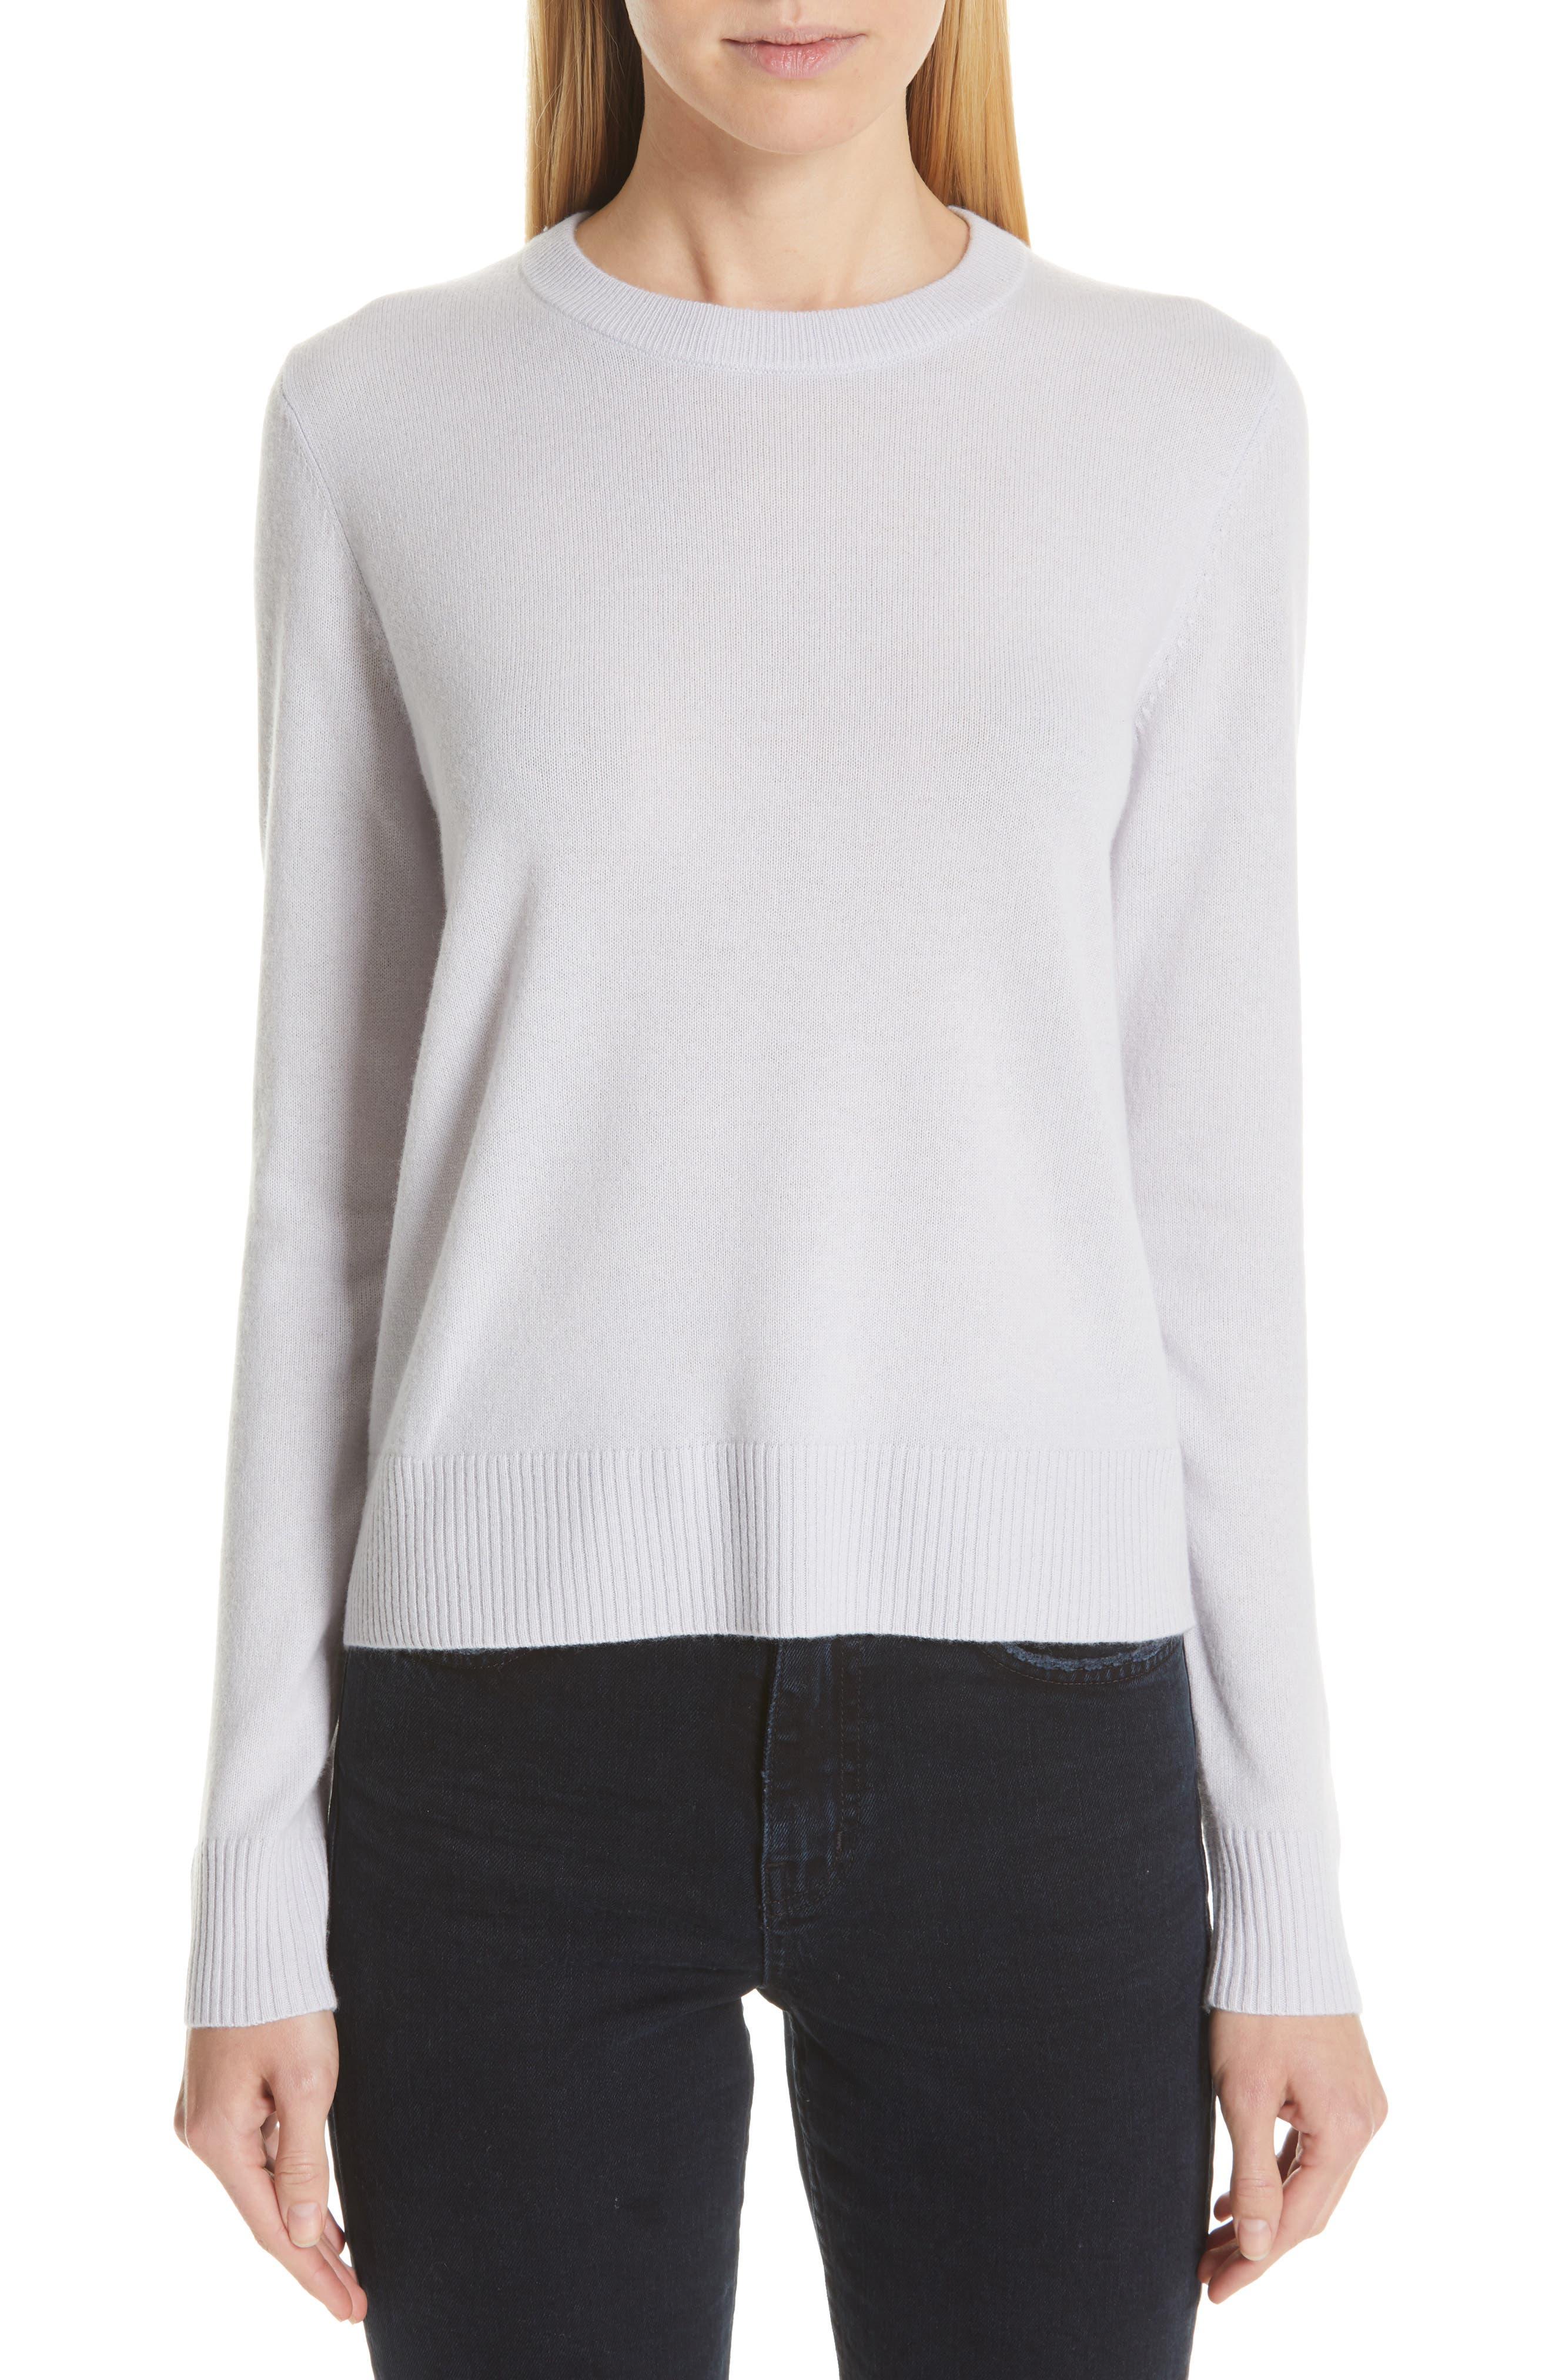 PROENZA SCHOULER, Cashmere Sweater, Main thumbnail 1, color, BLUE GREY